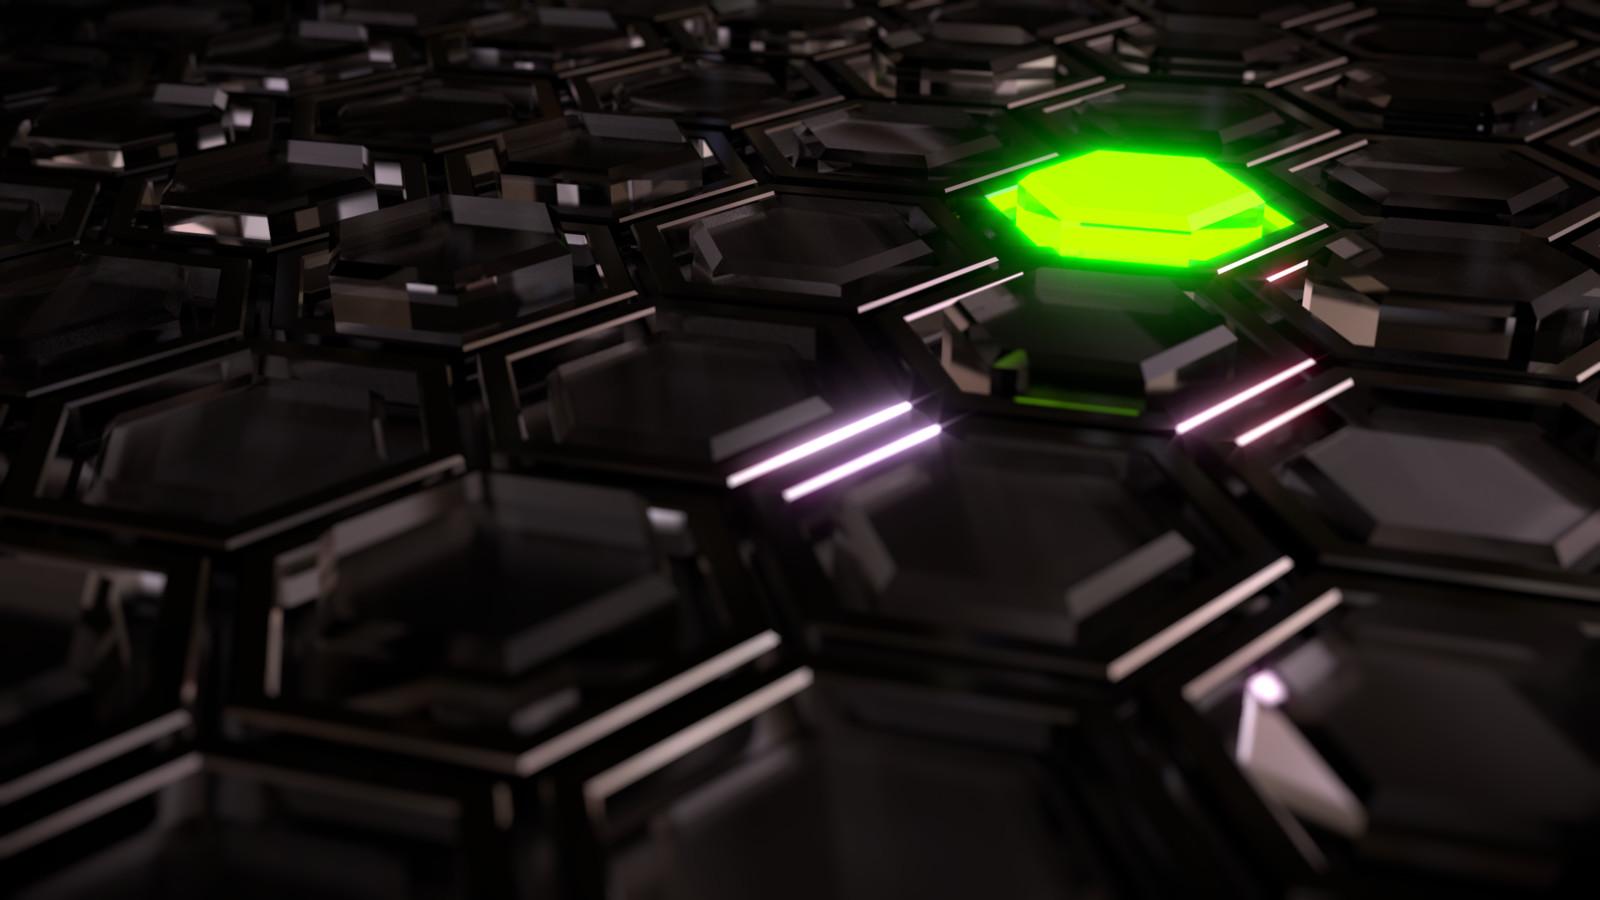 Glowing Hexa